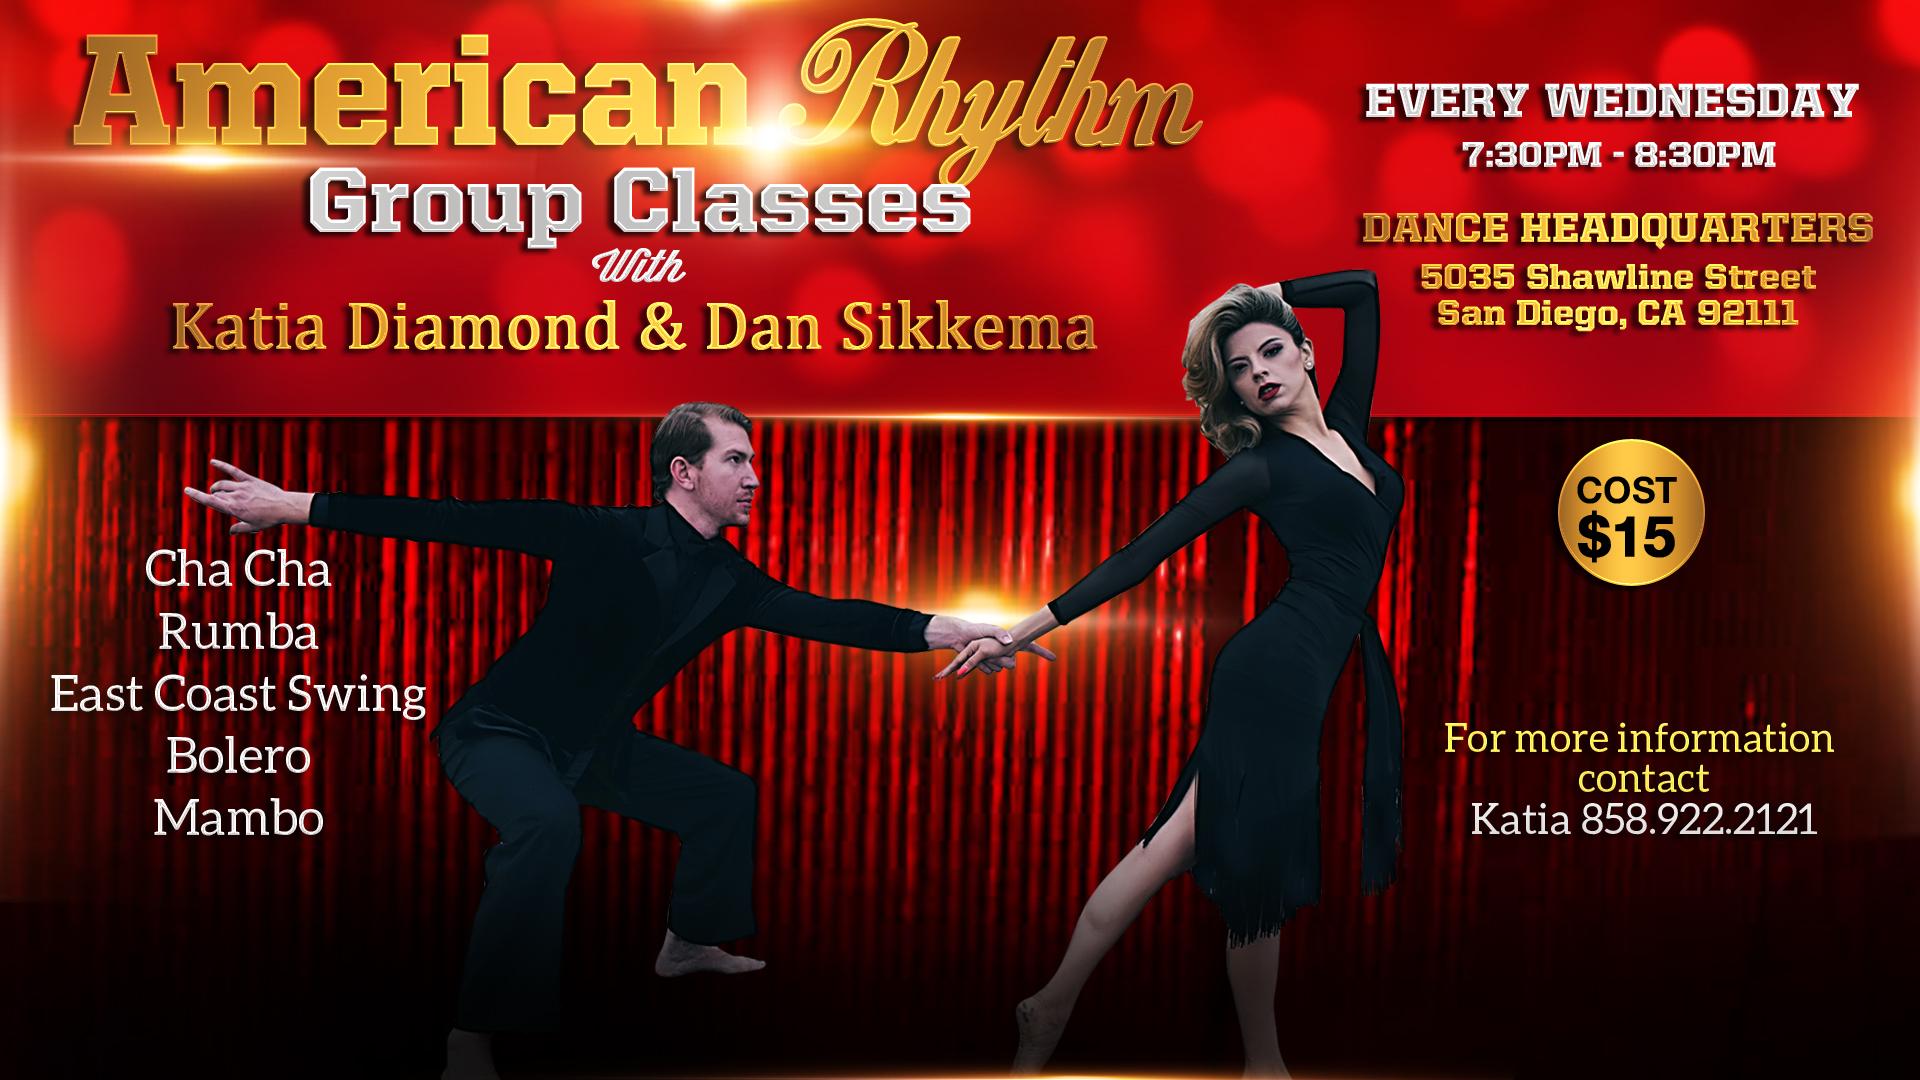 American Rhythm Group Classes with Katia & Dan